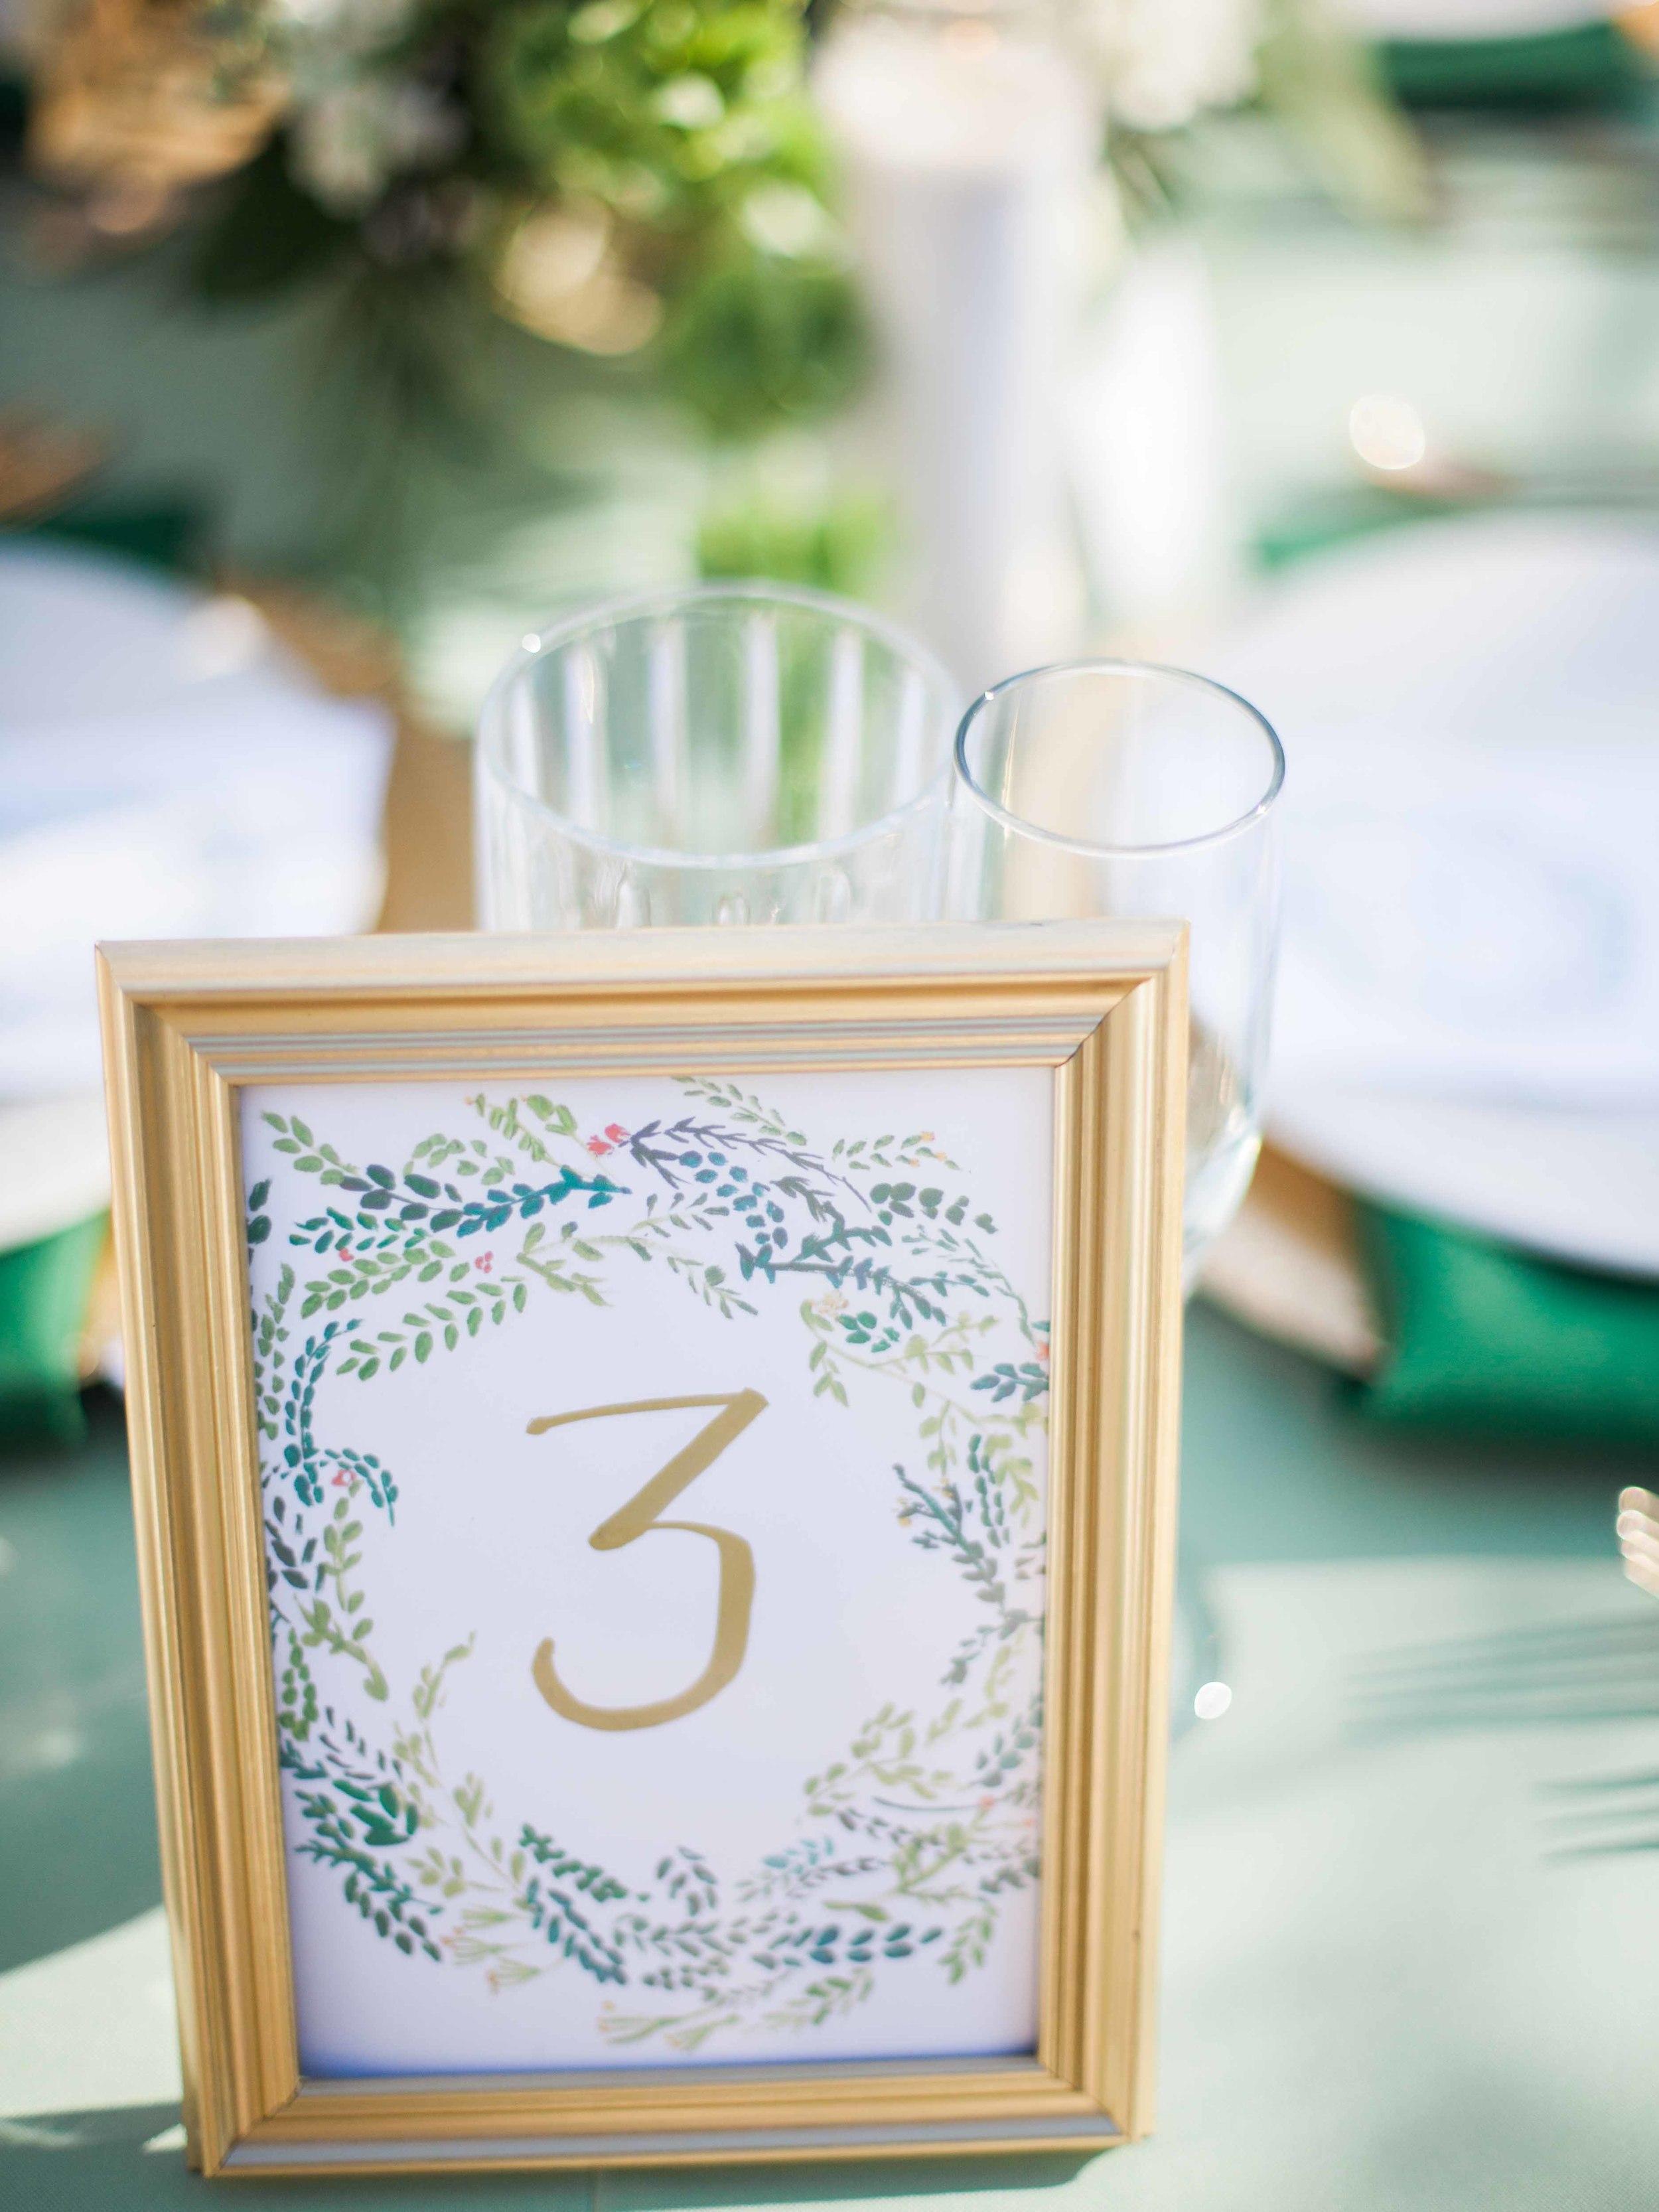 Coastal Lowcountry Wedding Inspiration at Burgwin Wright House by Wynona Benson Photography